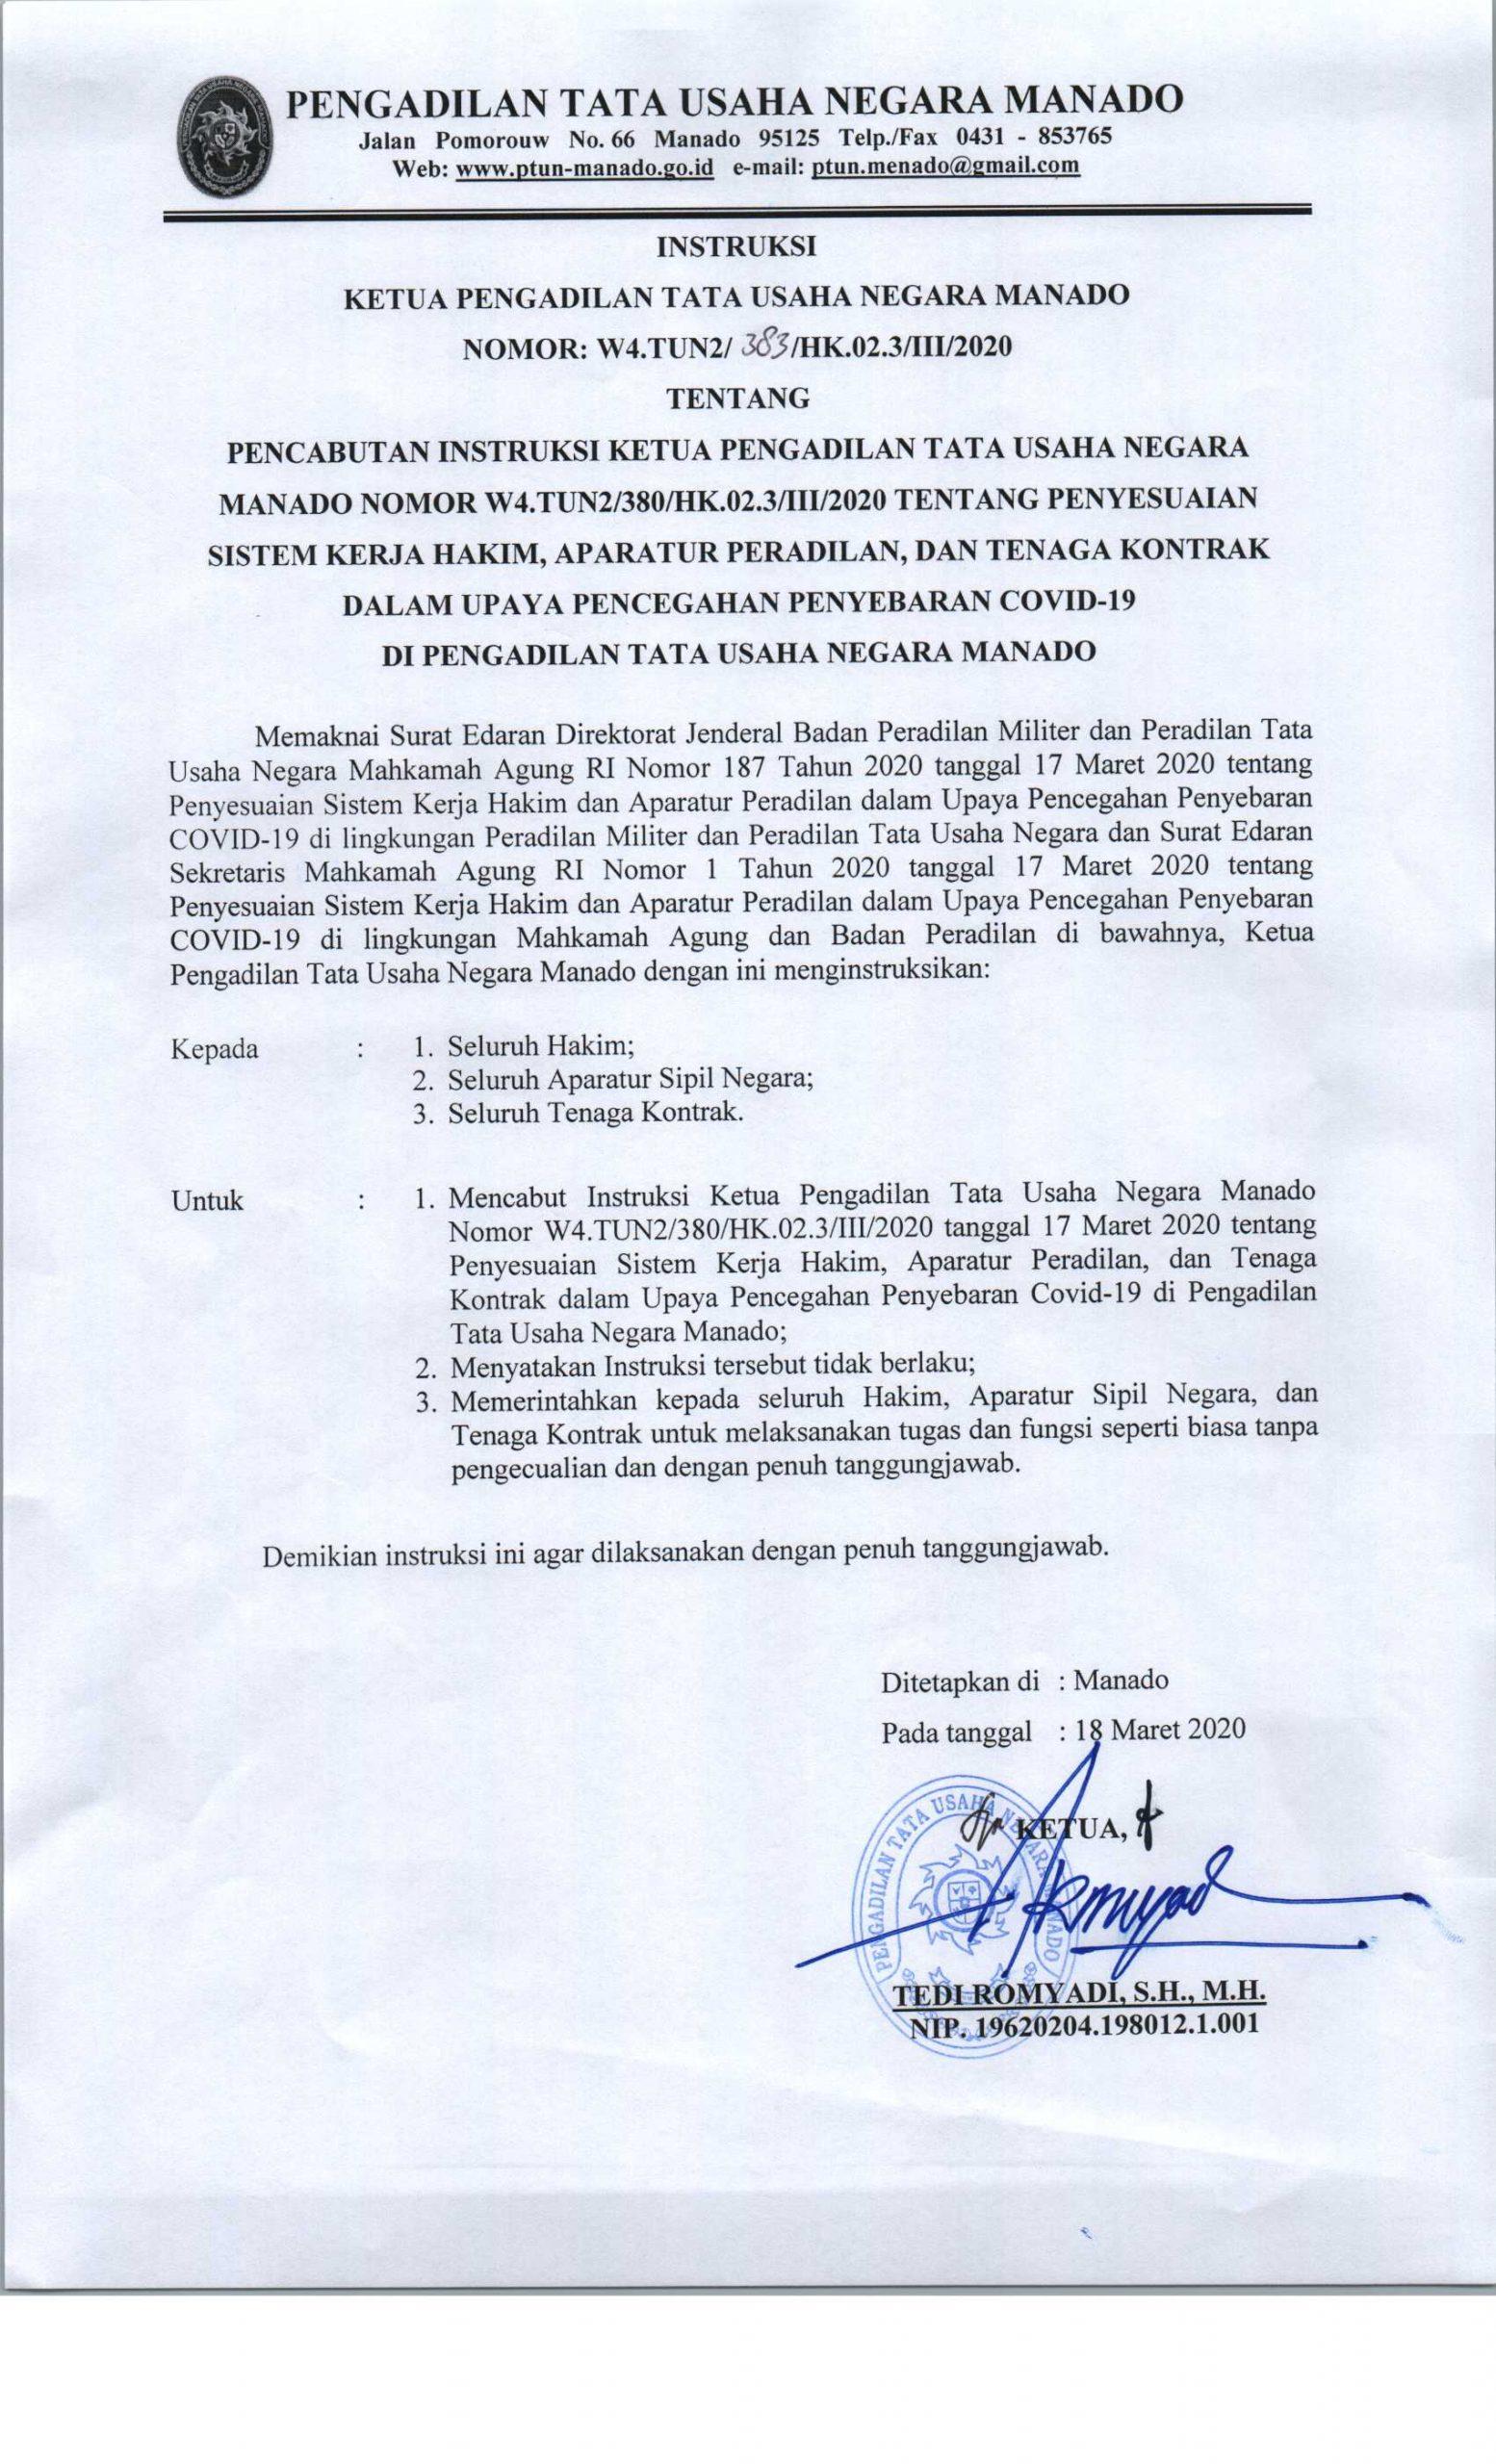 Pencabutan Instruksi Ketua Pengadilan Tata Usaha Negara Manado